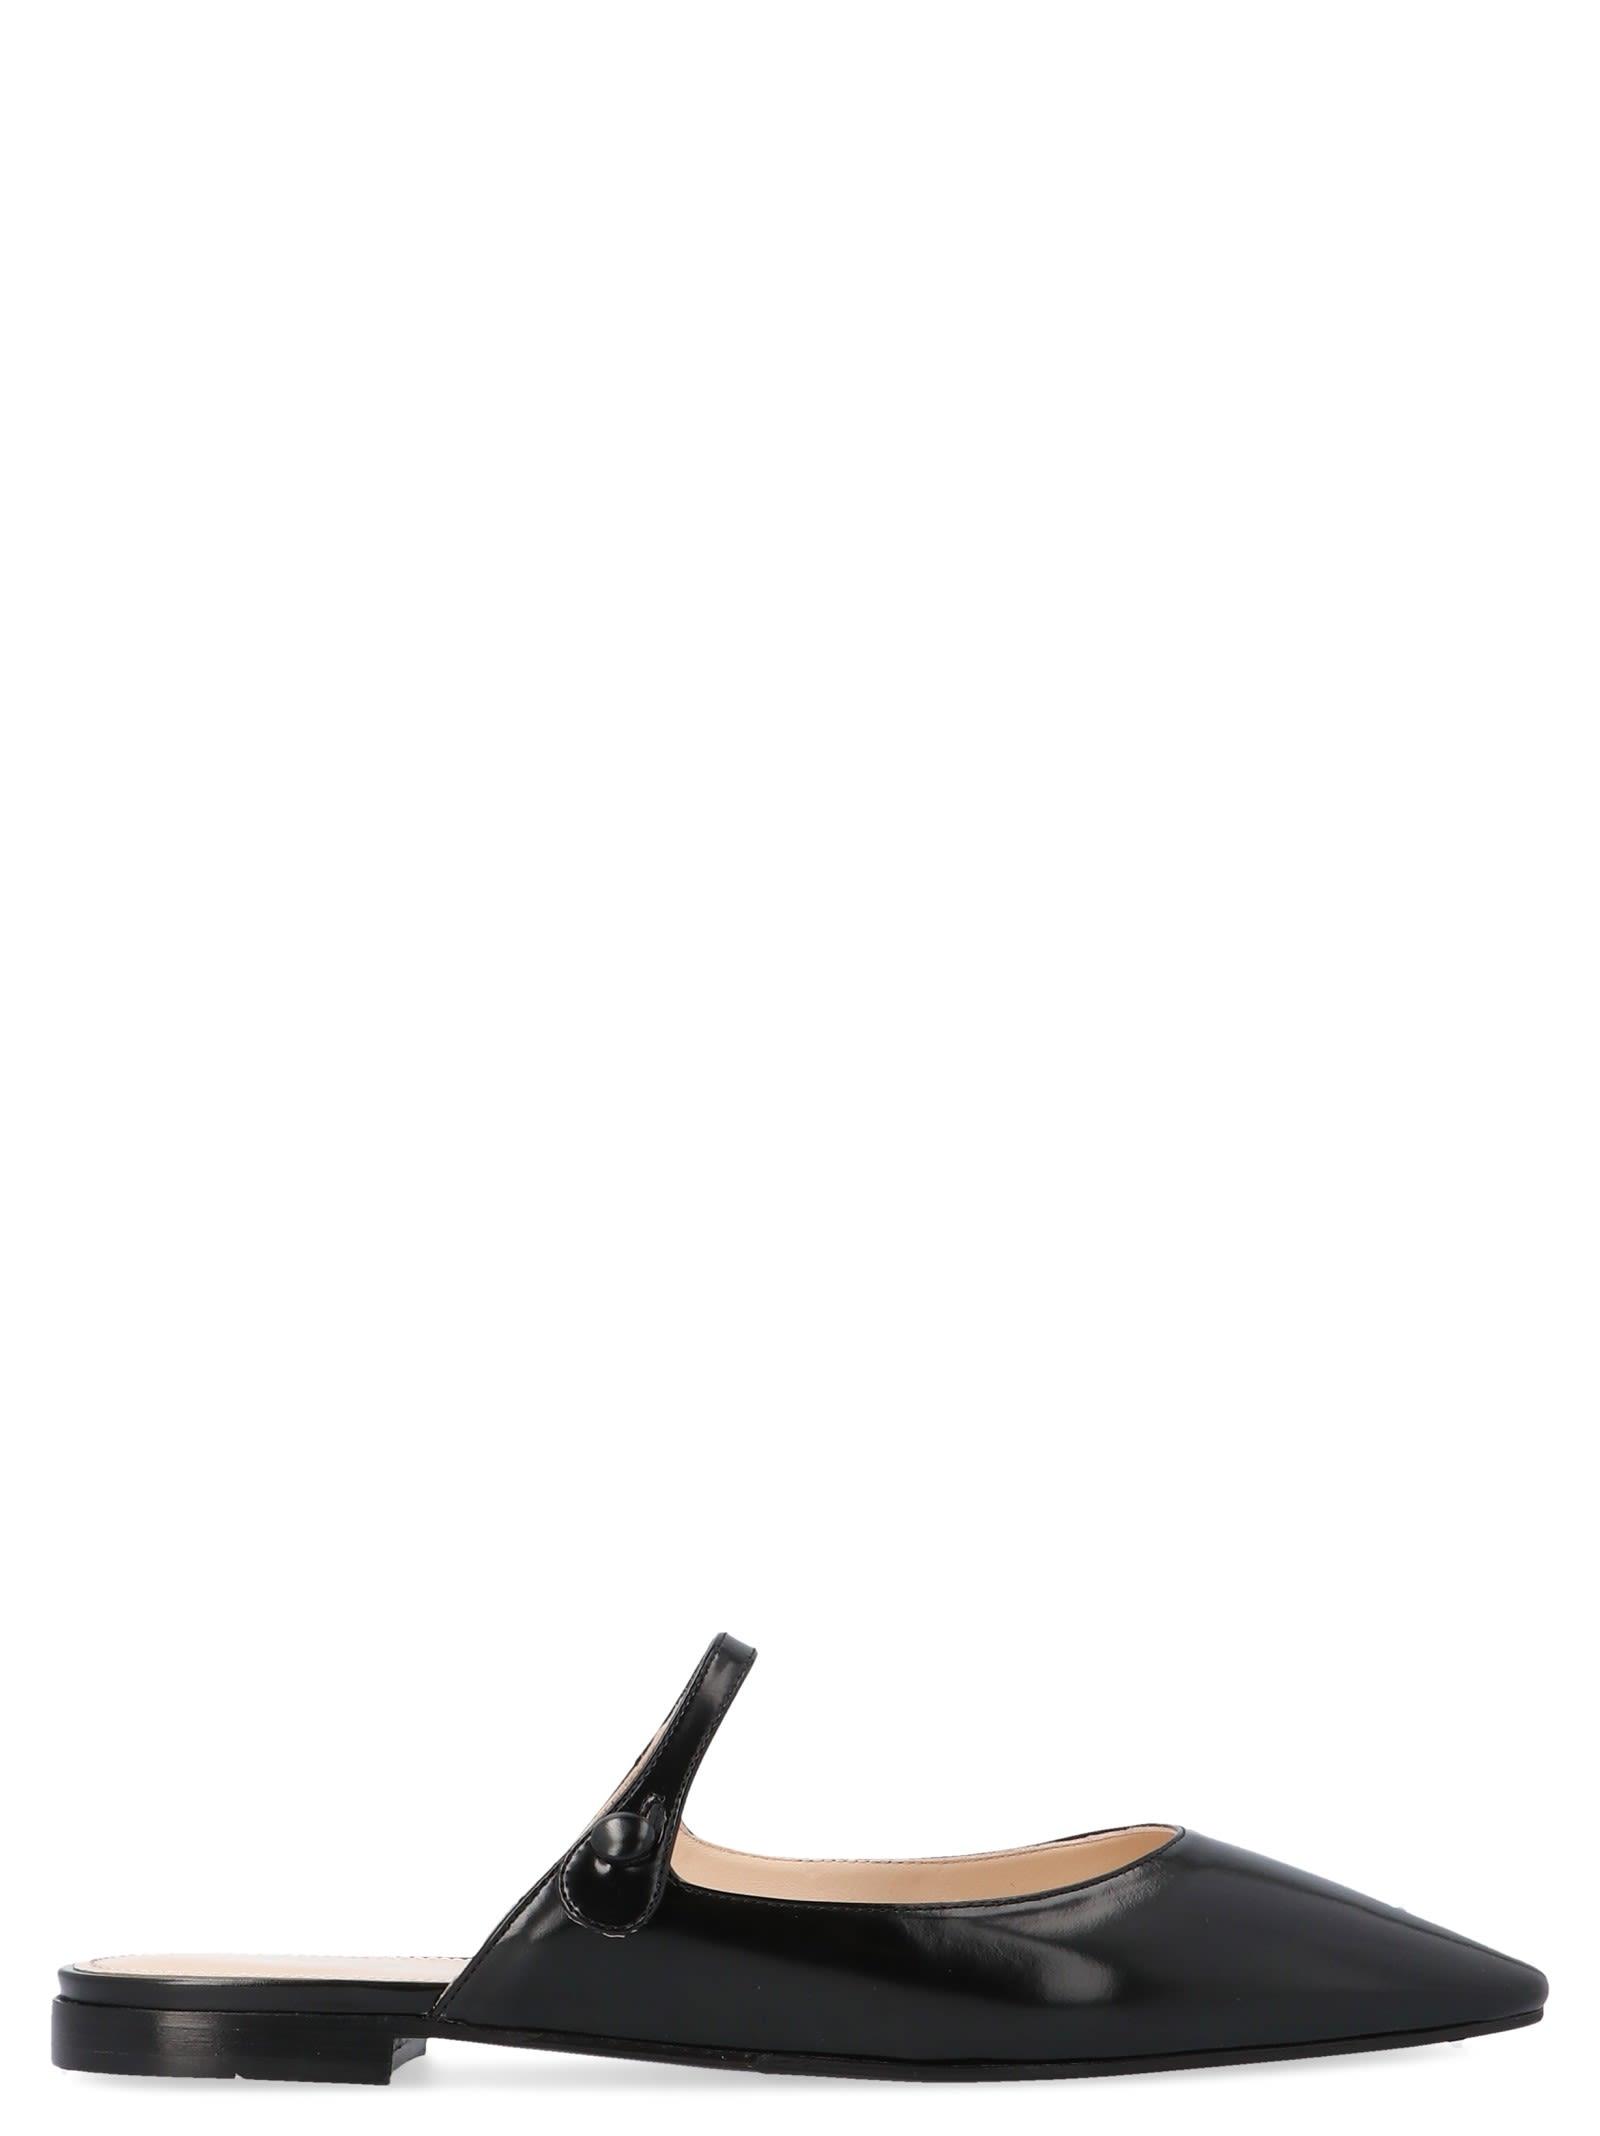 Prada Flat Shoes | italist, ALWAYS LIKE